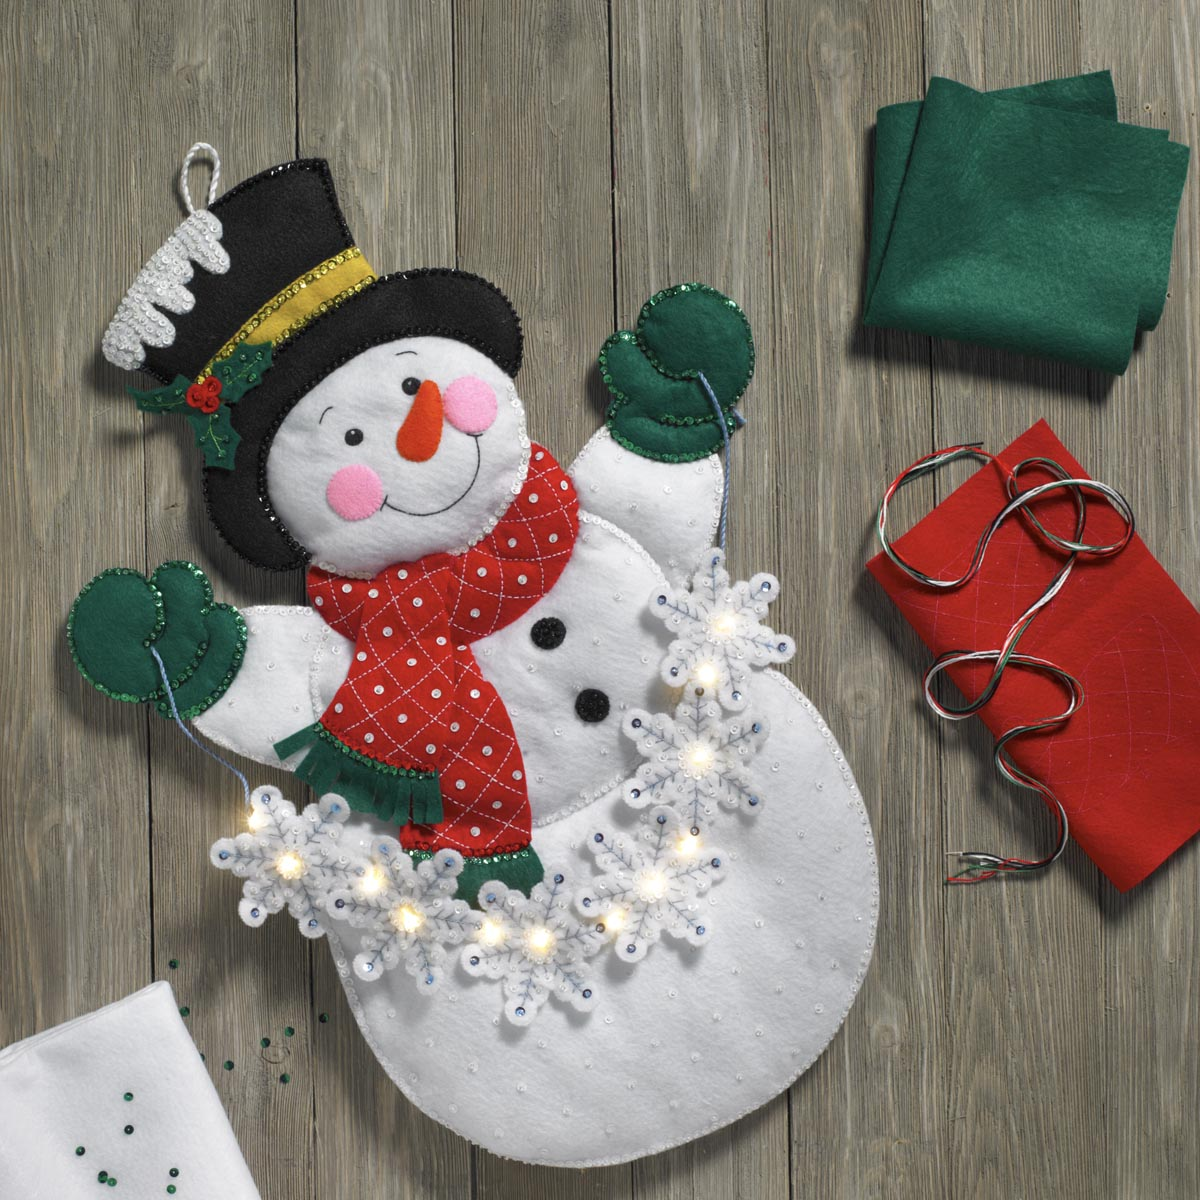 Bucilla ® Seasonal - Felt - Home Decor - Snowman with Snowflakes Wall Hanging with Lights